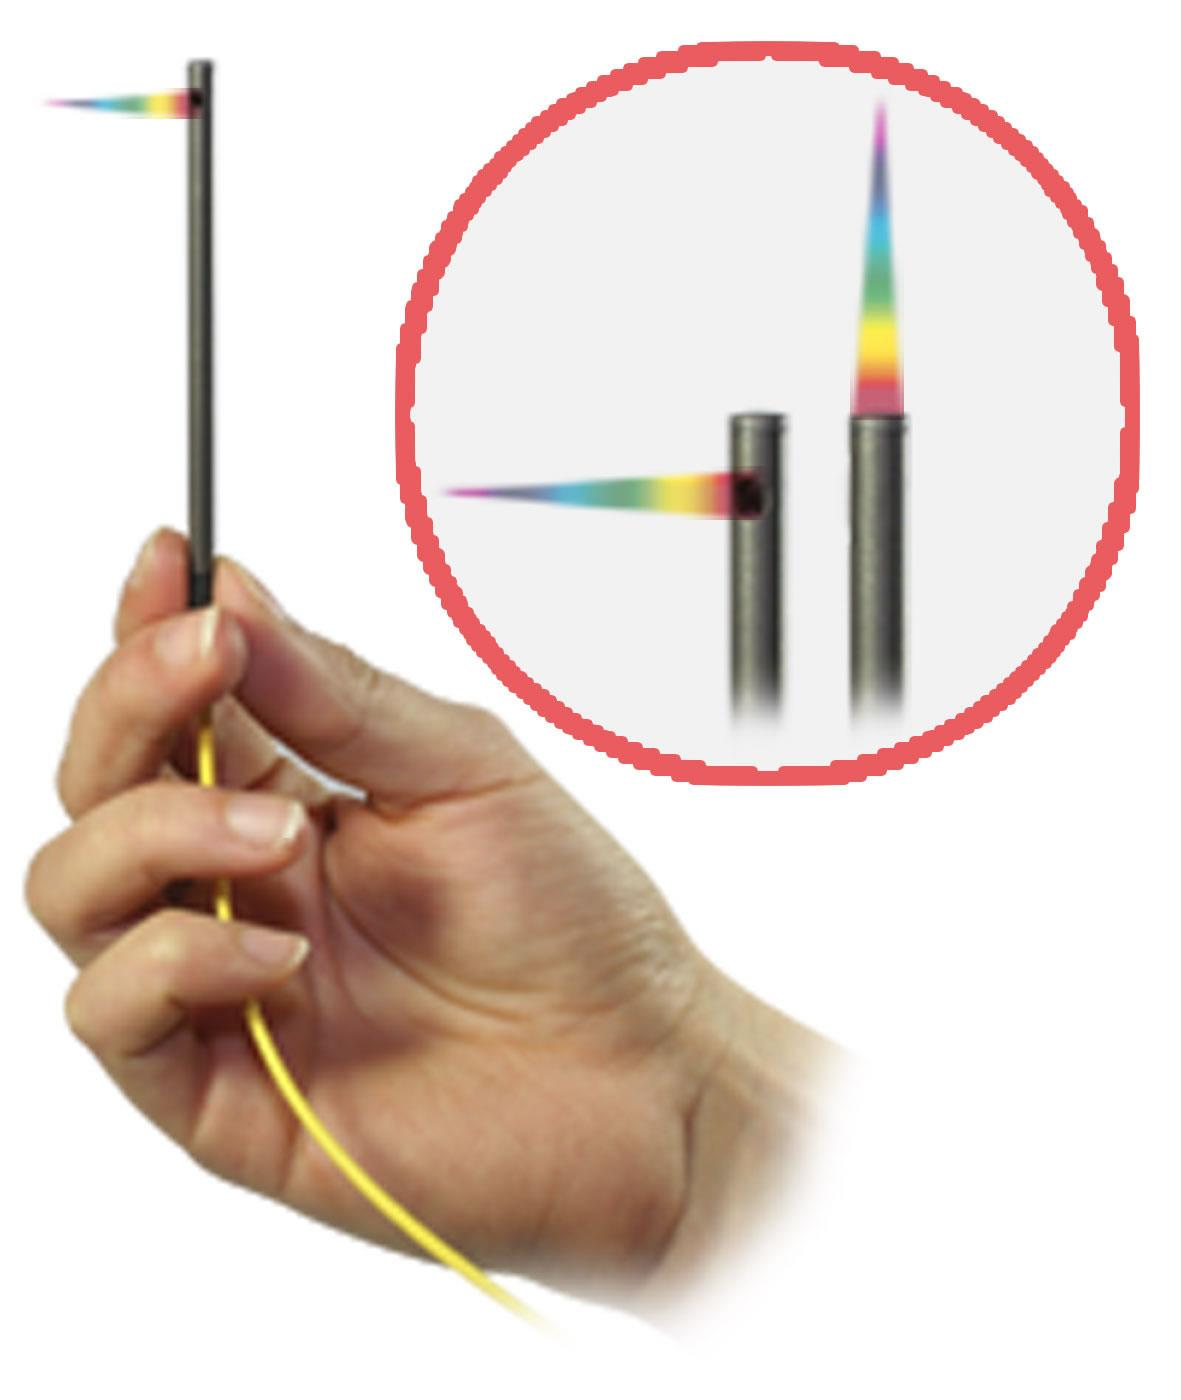 The miniaturisation of sensors: the 4mm diameter IFS 2402 confocal sensor